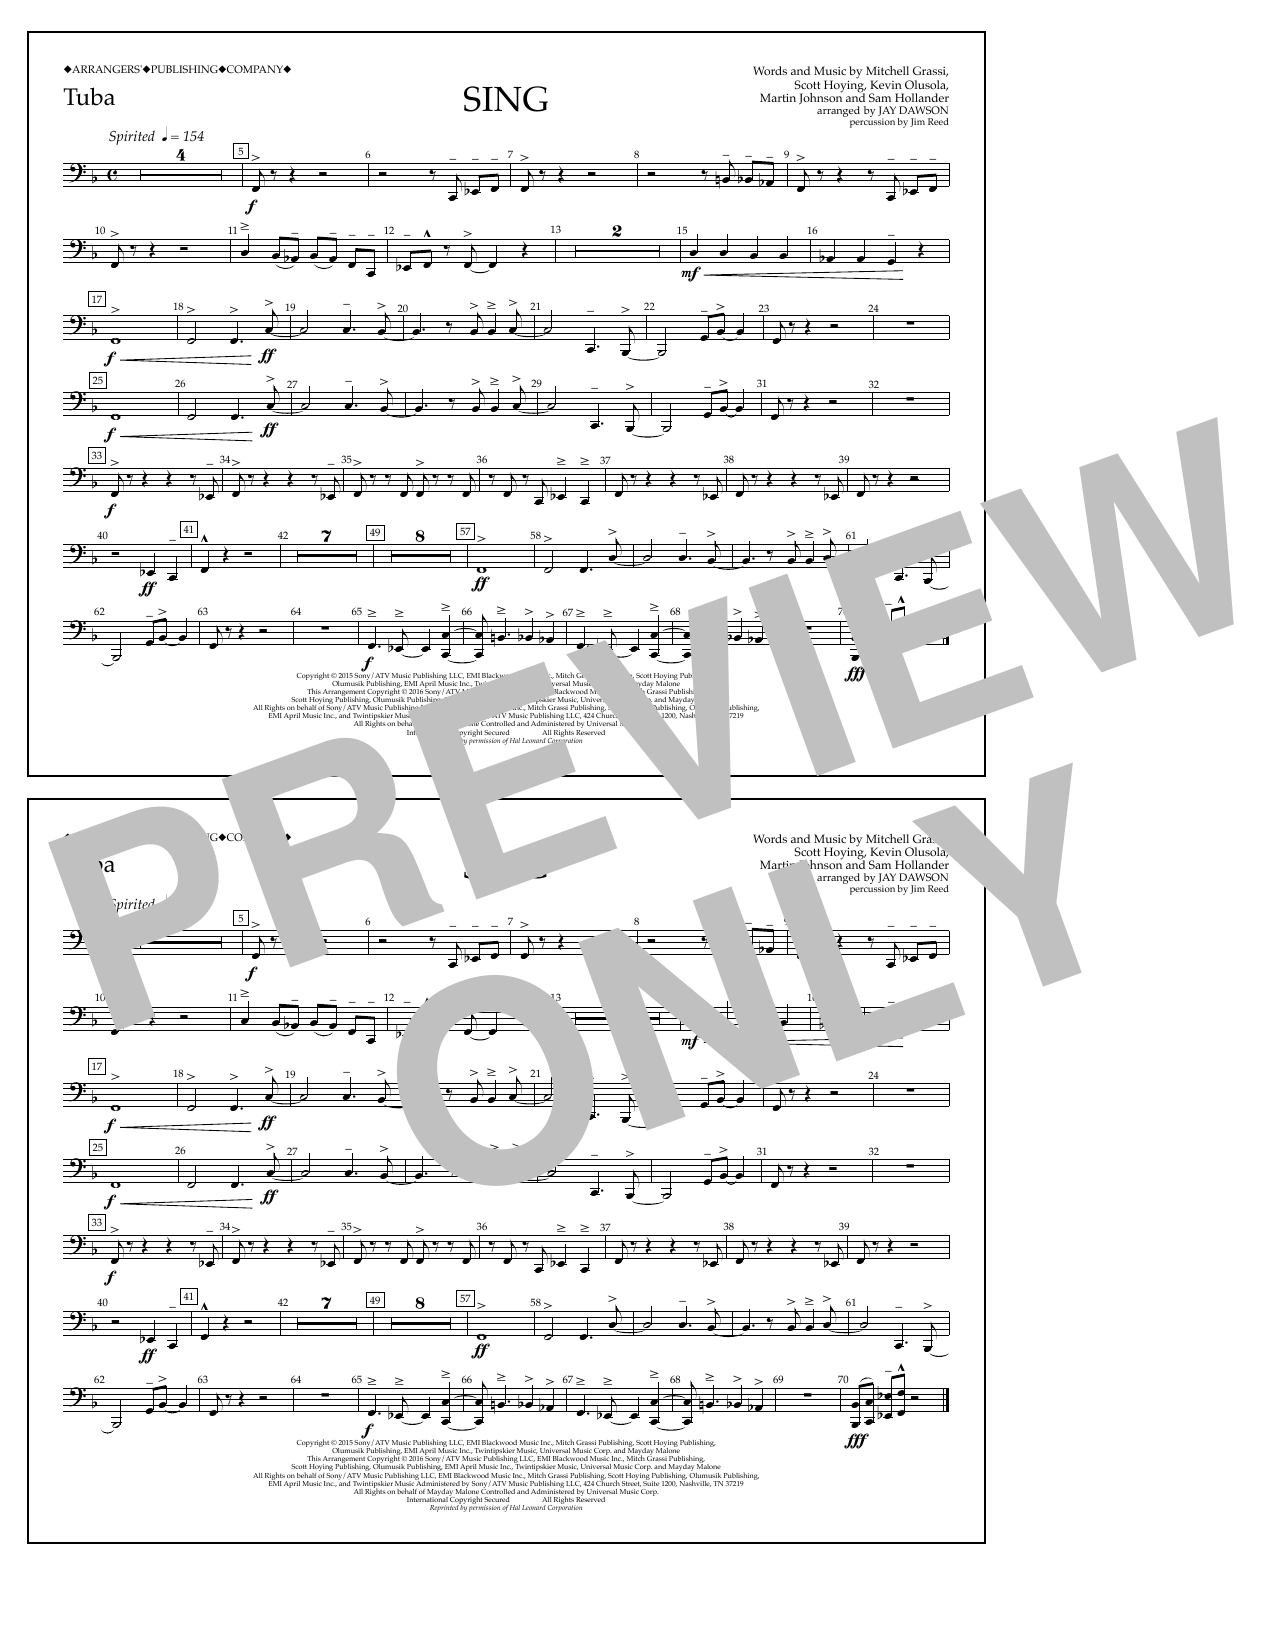 Pentatonix - Sing - Tuba